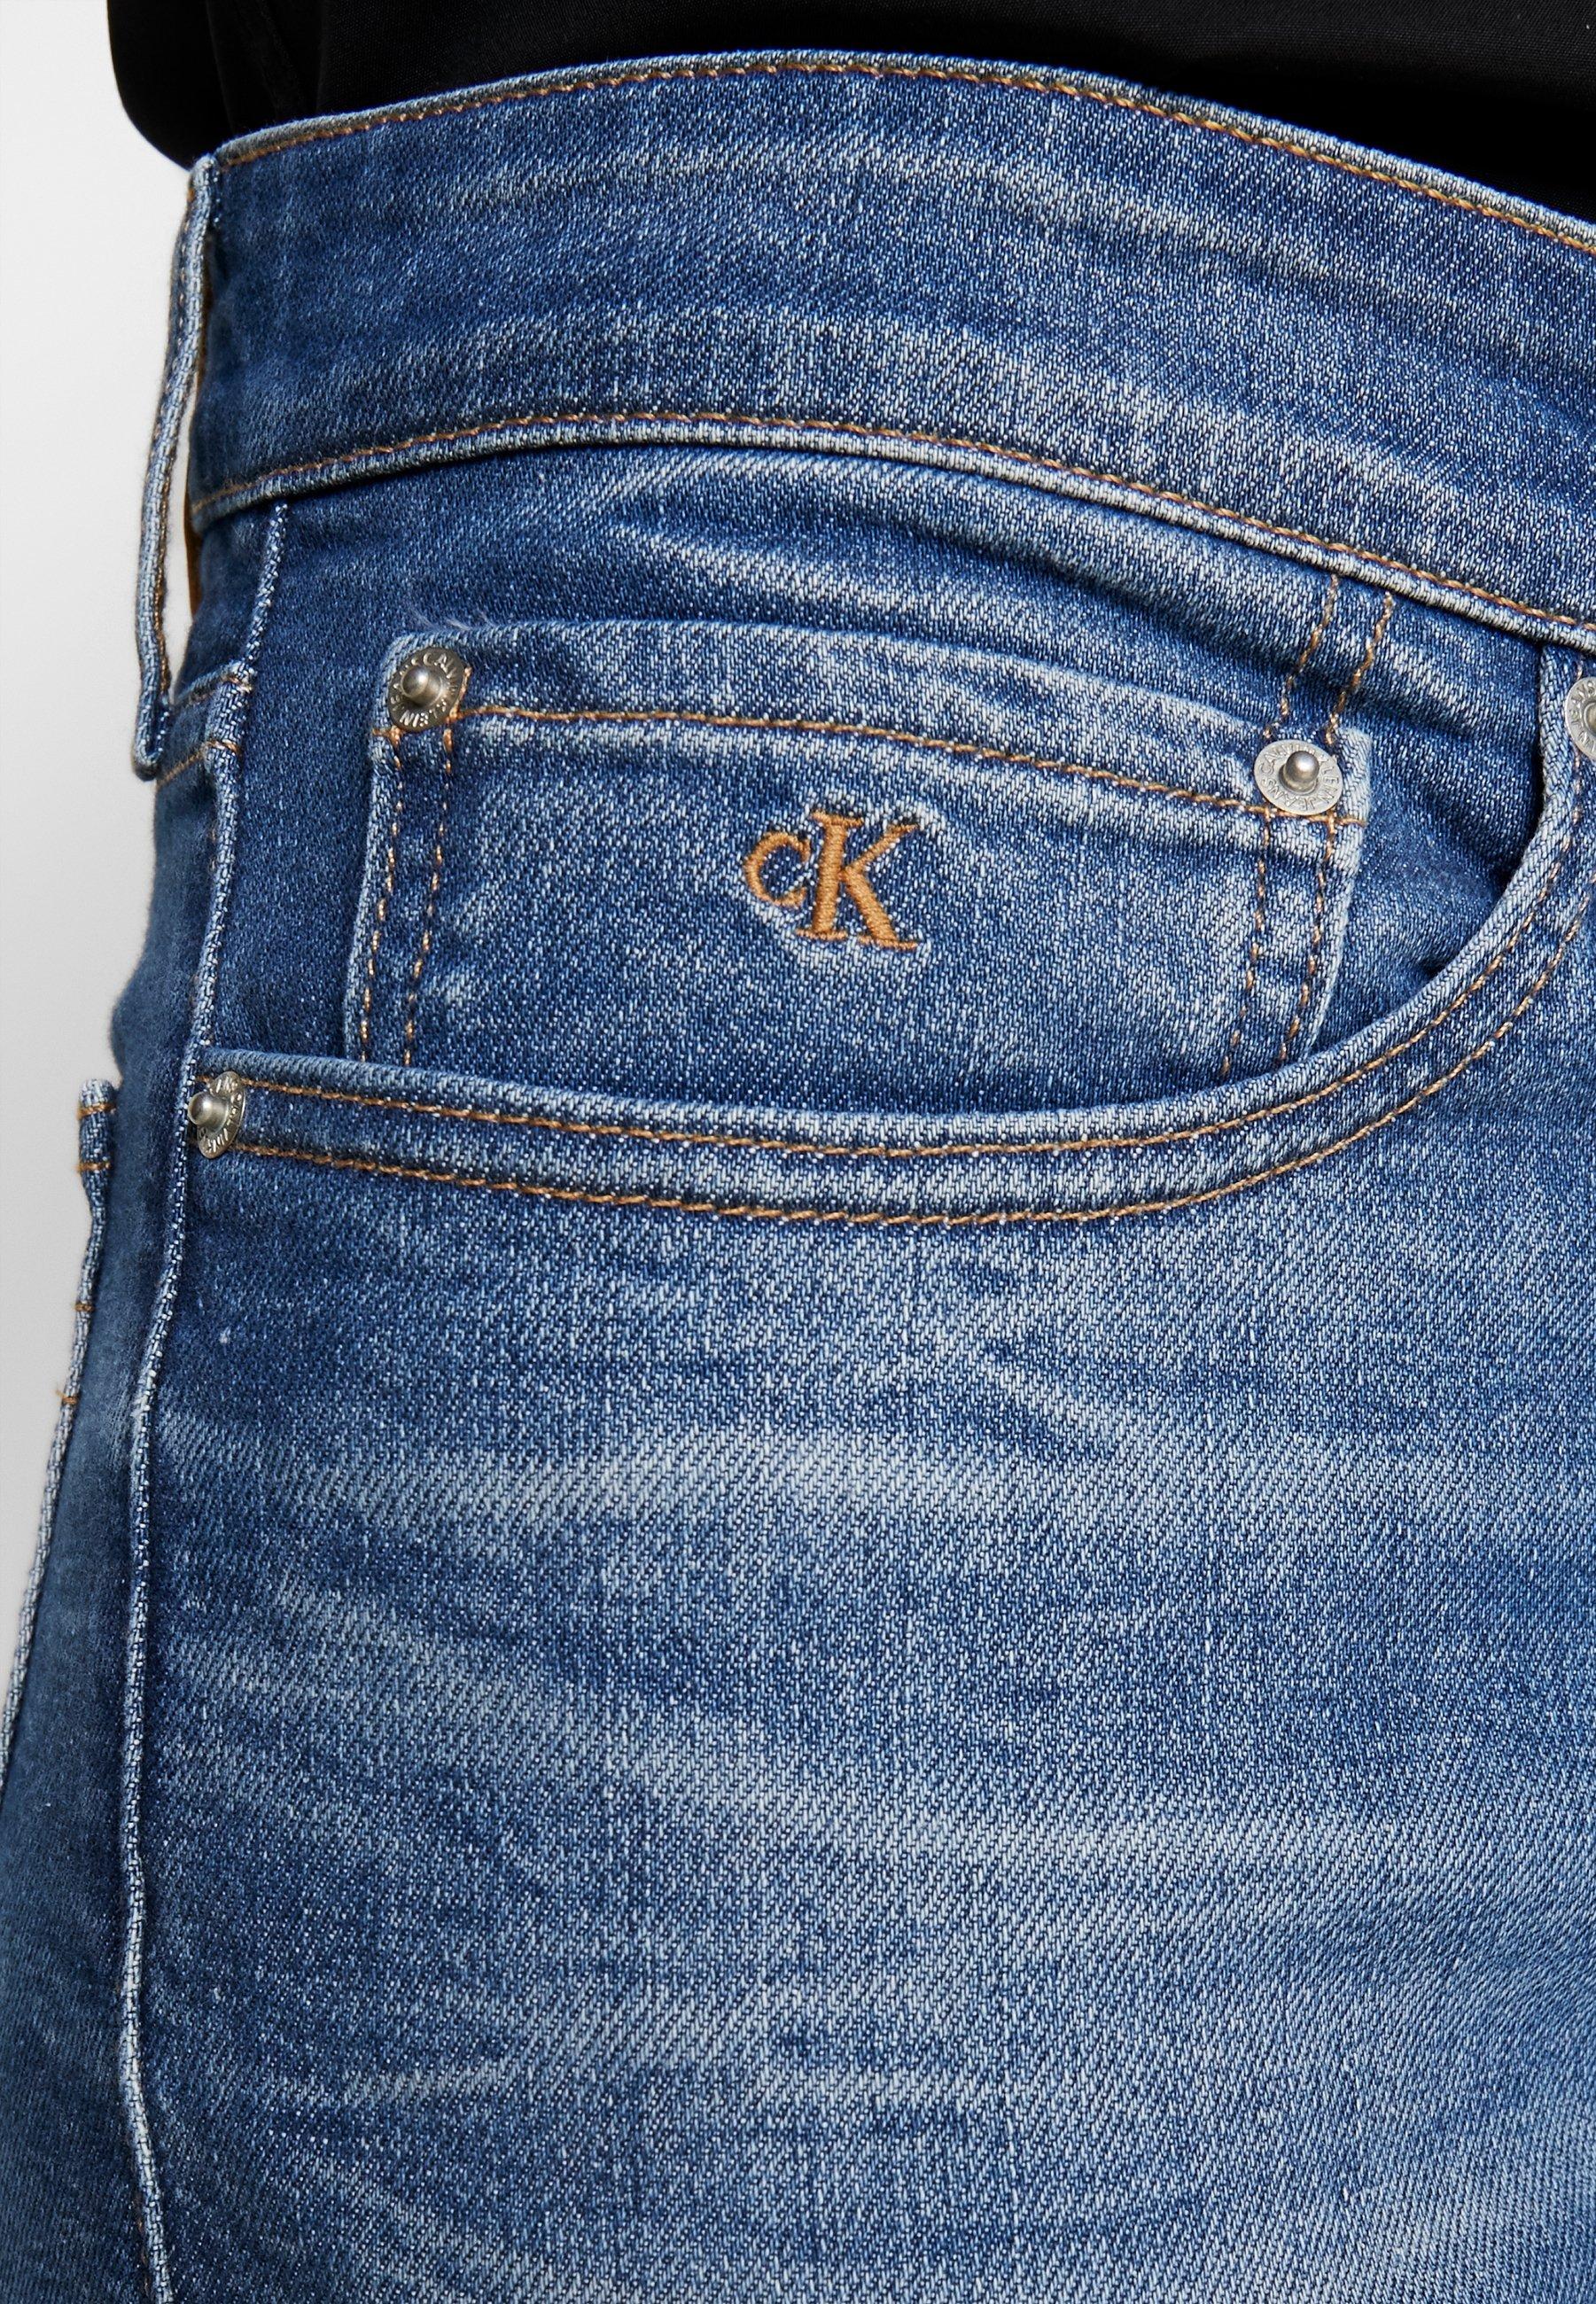 Calvin Klein Jeans Ckj 026 Slim - Fit Light Blue